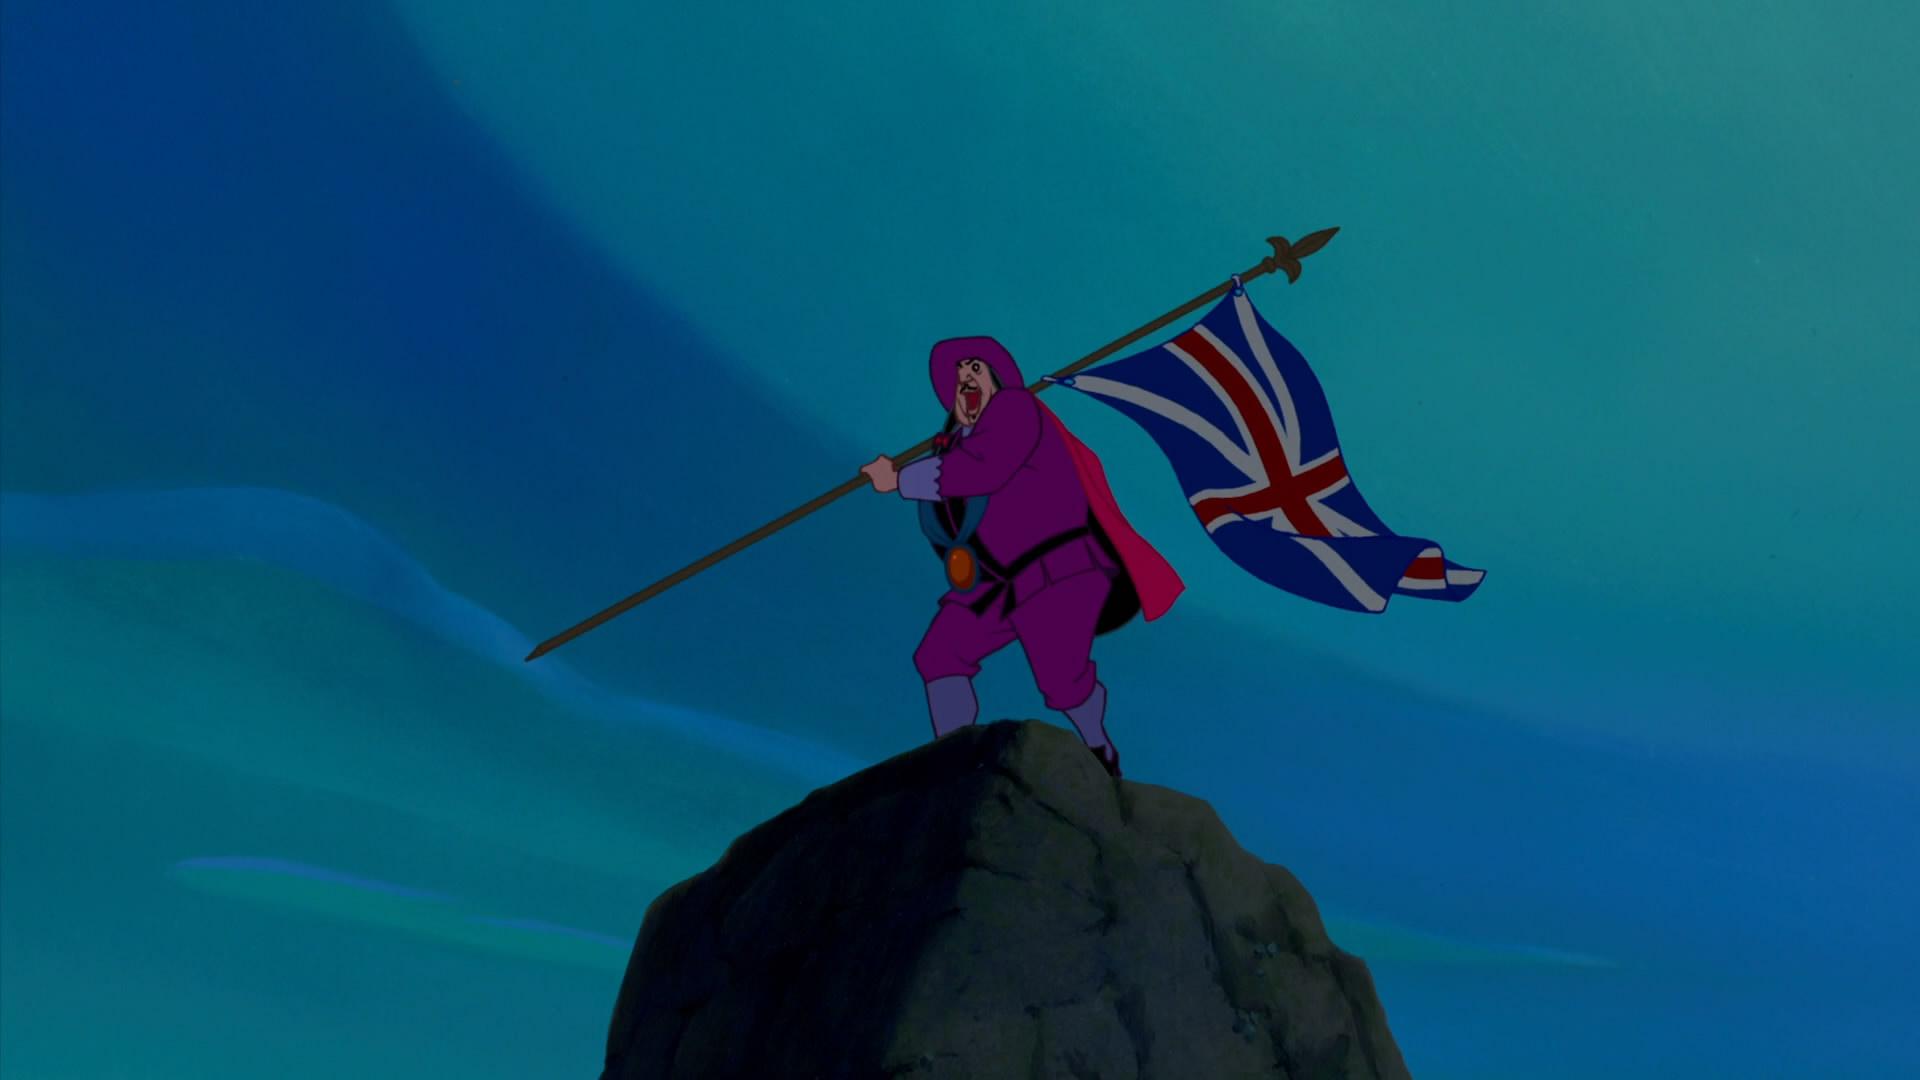 Pocahontas.1995.BluRay.1080p.Rus.Eng.x264-CHD.mkv_snapshot_00.28.44_[2012.04.01_10.36.04].jpg